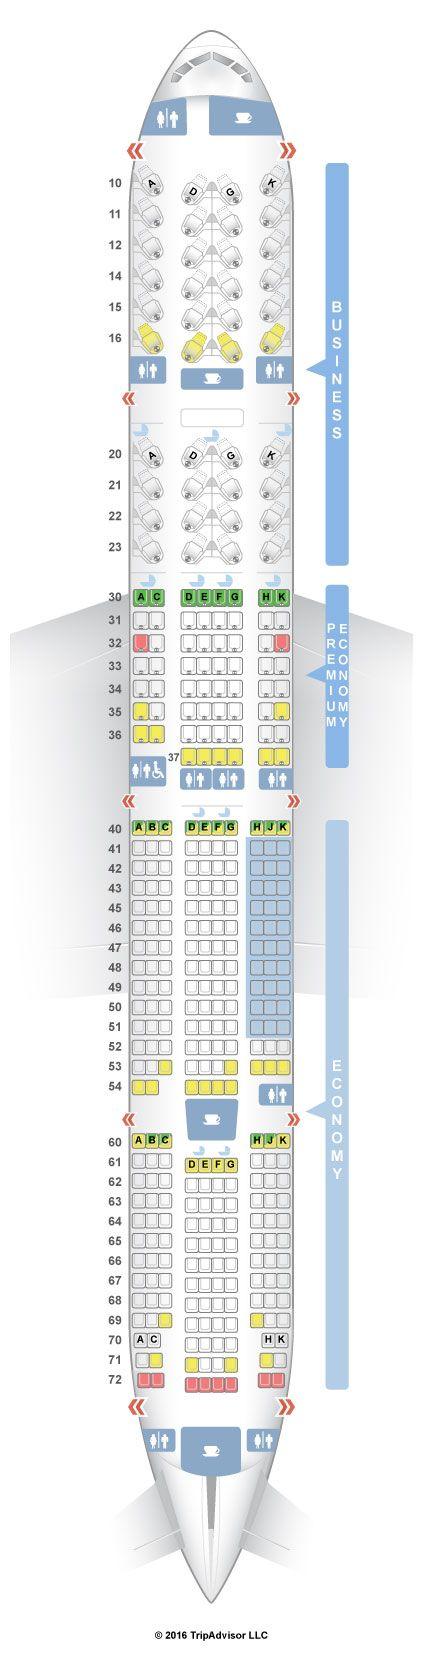 SeatGuru Seat Map China Airlines Boeing 777-300ER (77W)